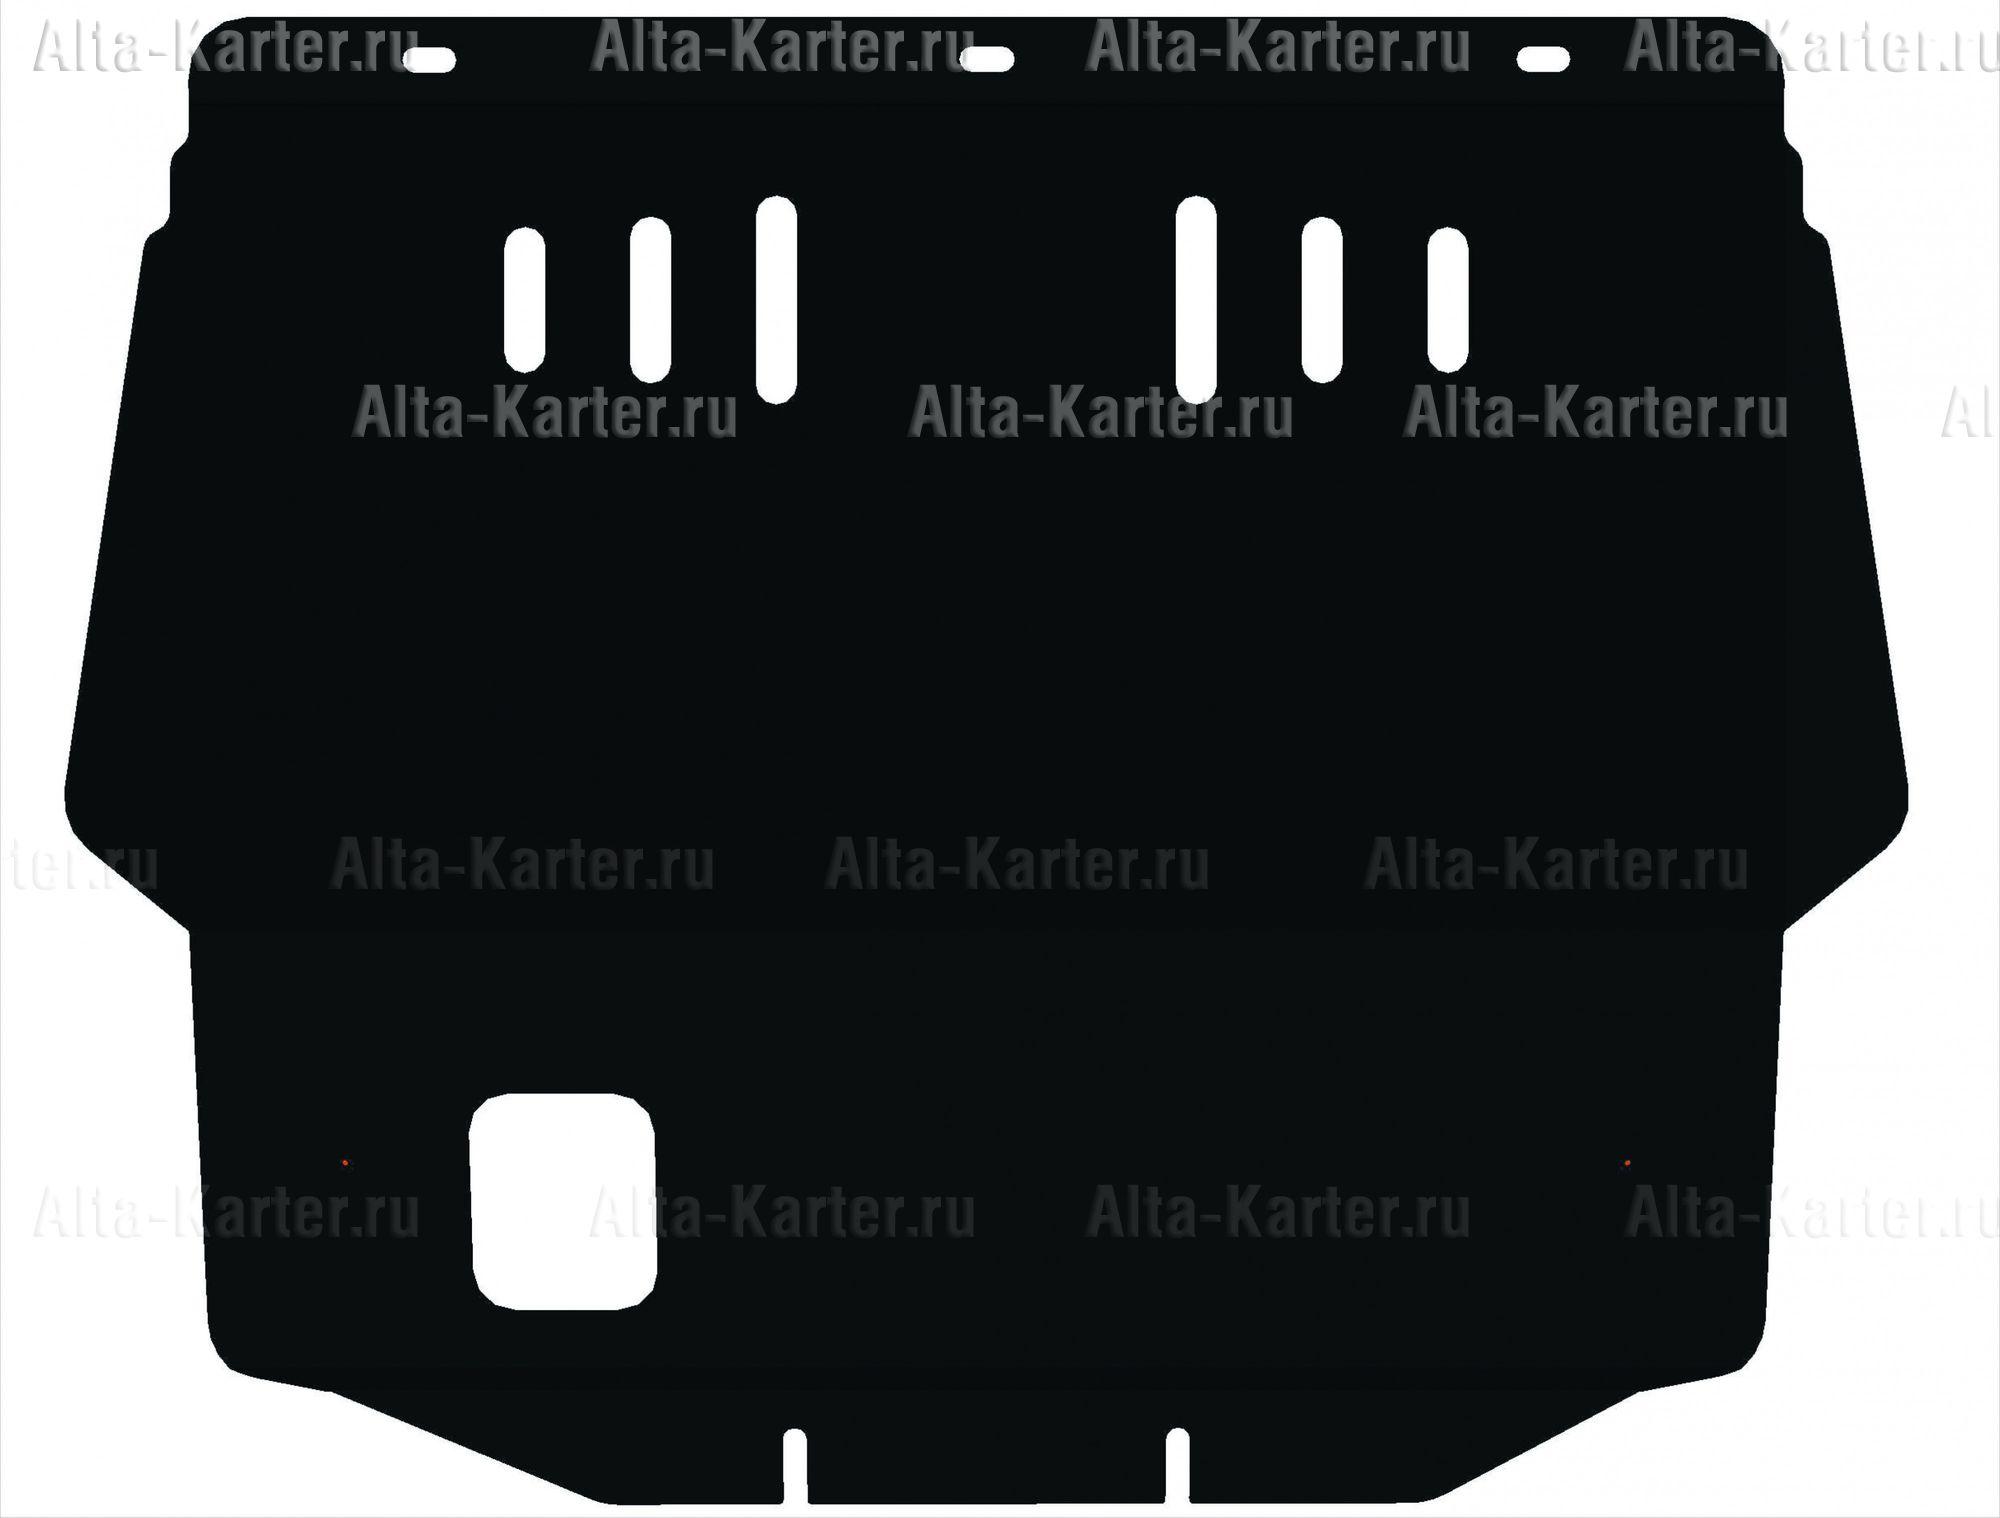 Защита Alfeco для картера и КПП Citroen Xsara Mark 1 1997-2000. Артикул ALF.04.05